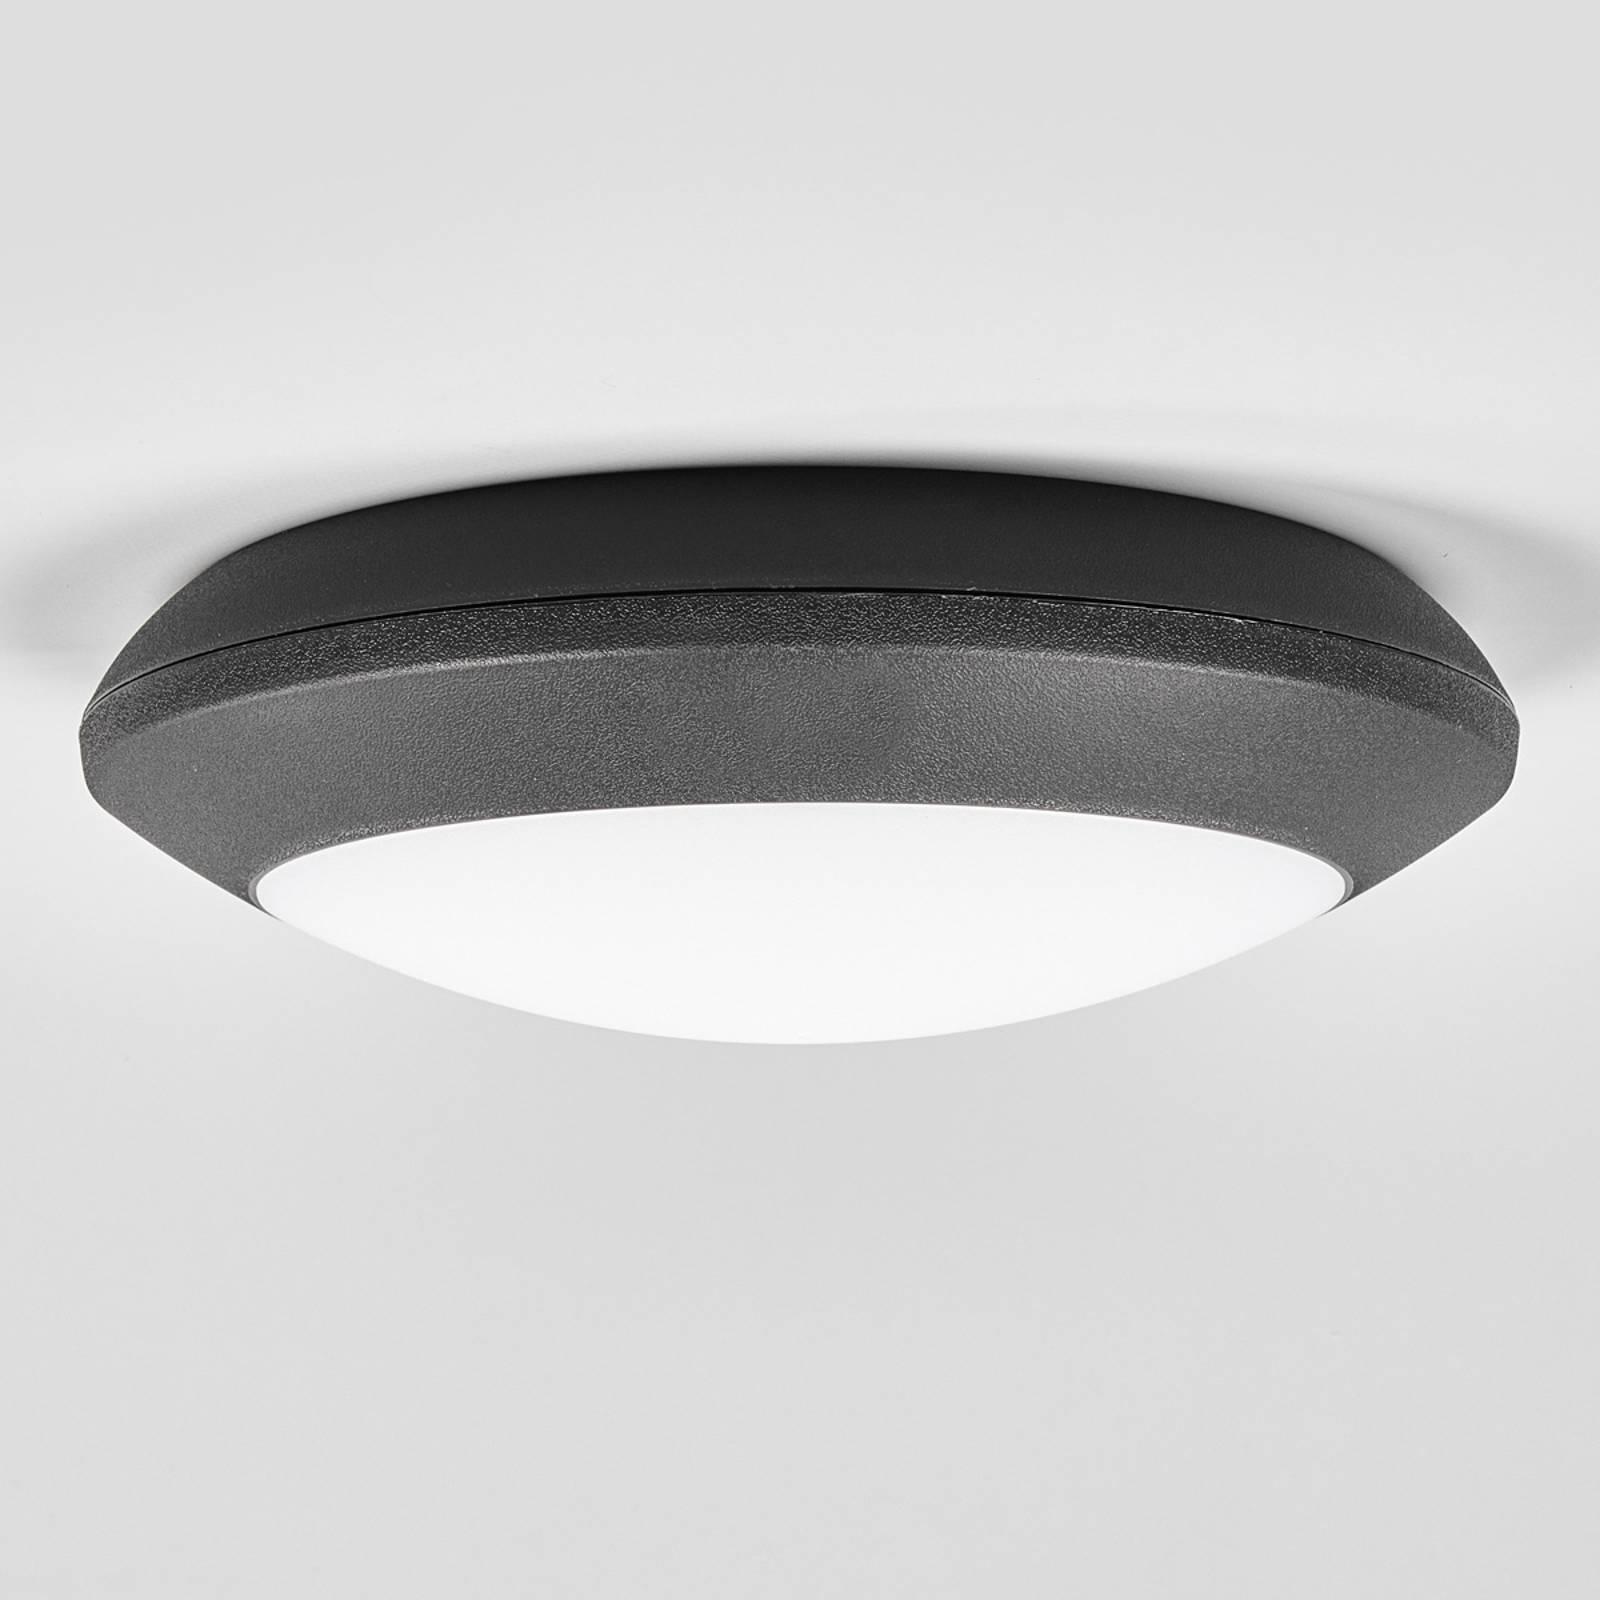 Lampa sufitowa zewnętrzna LED Carlo, czarna, CCT